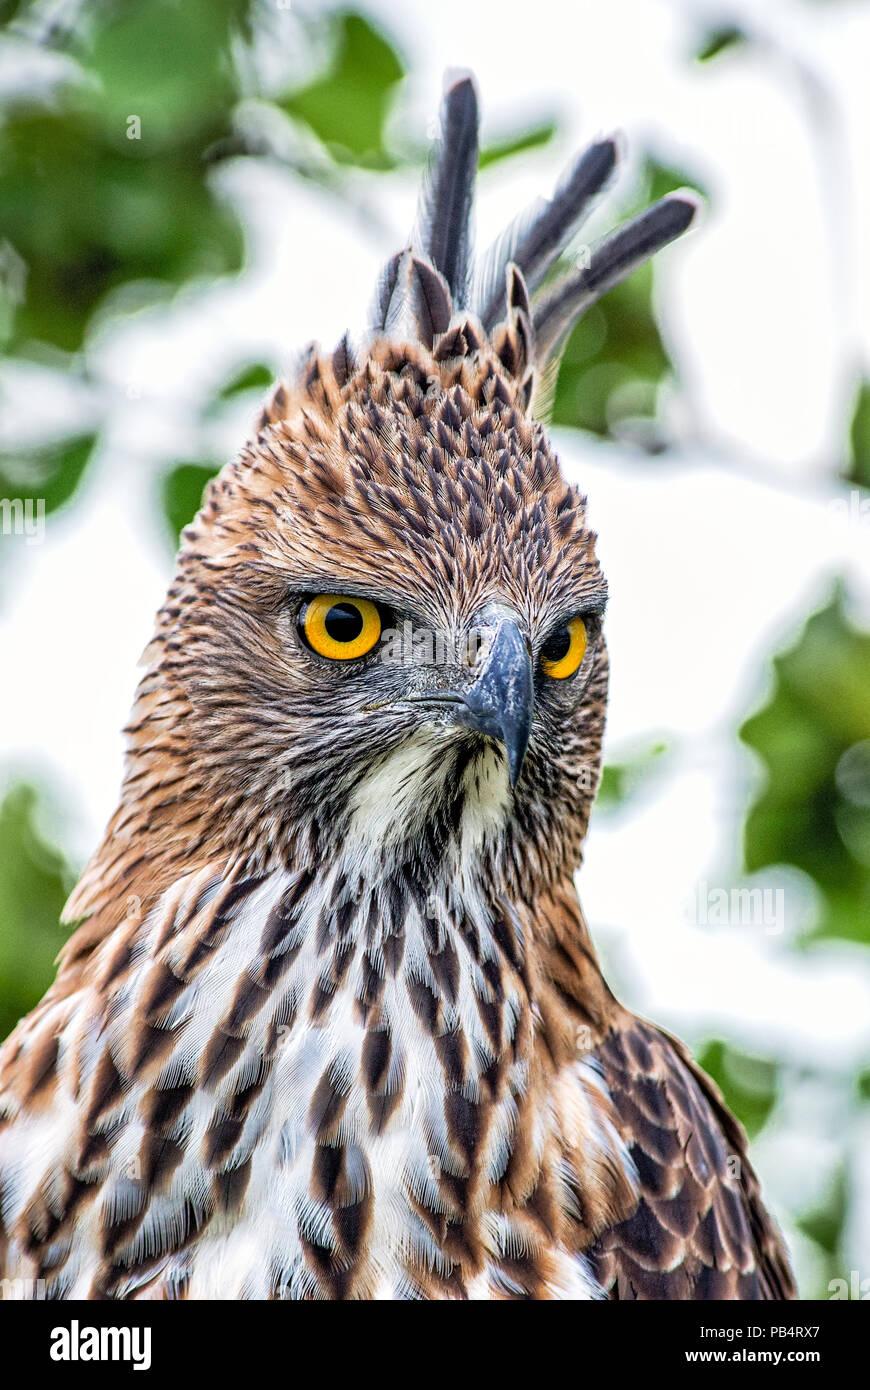 Changeable Hawk-eagle - Spizaetus cirrhatus, beautiful large bird of prey from Sri Lankan woodlands. - Stock Image